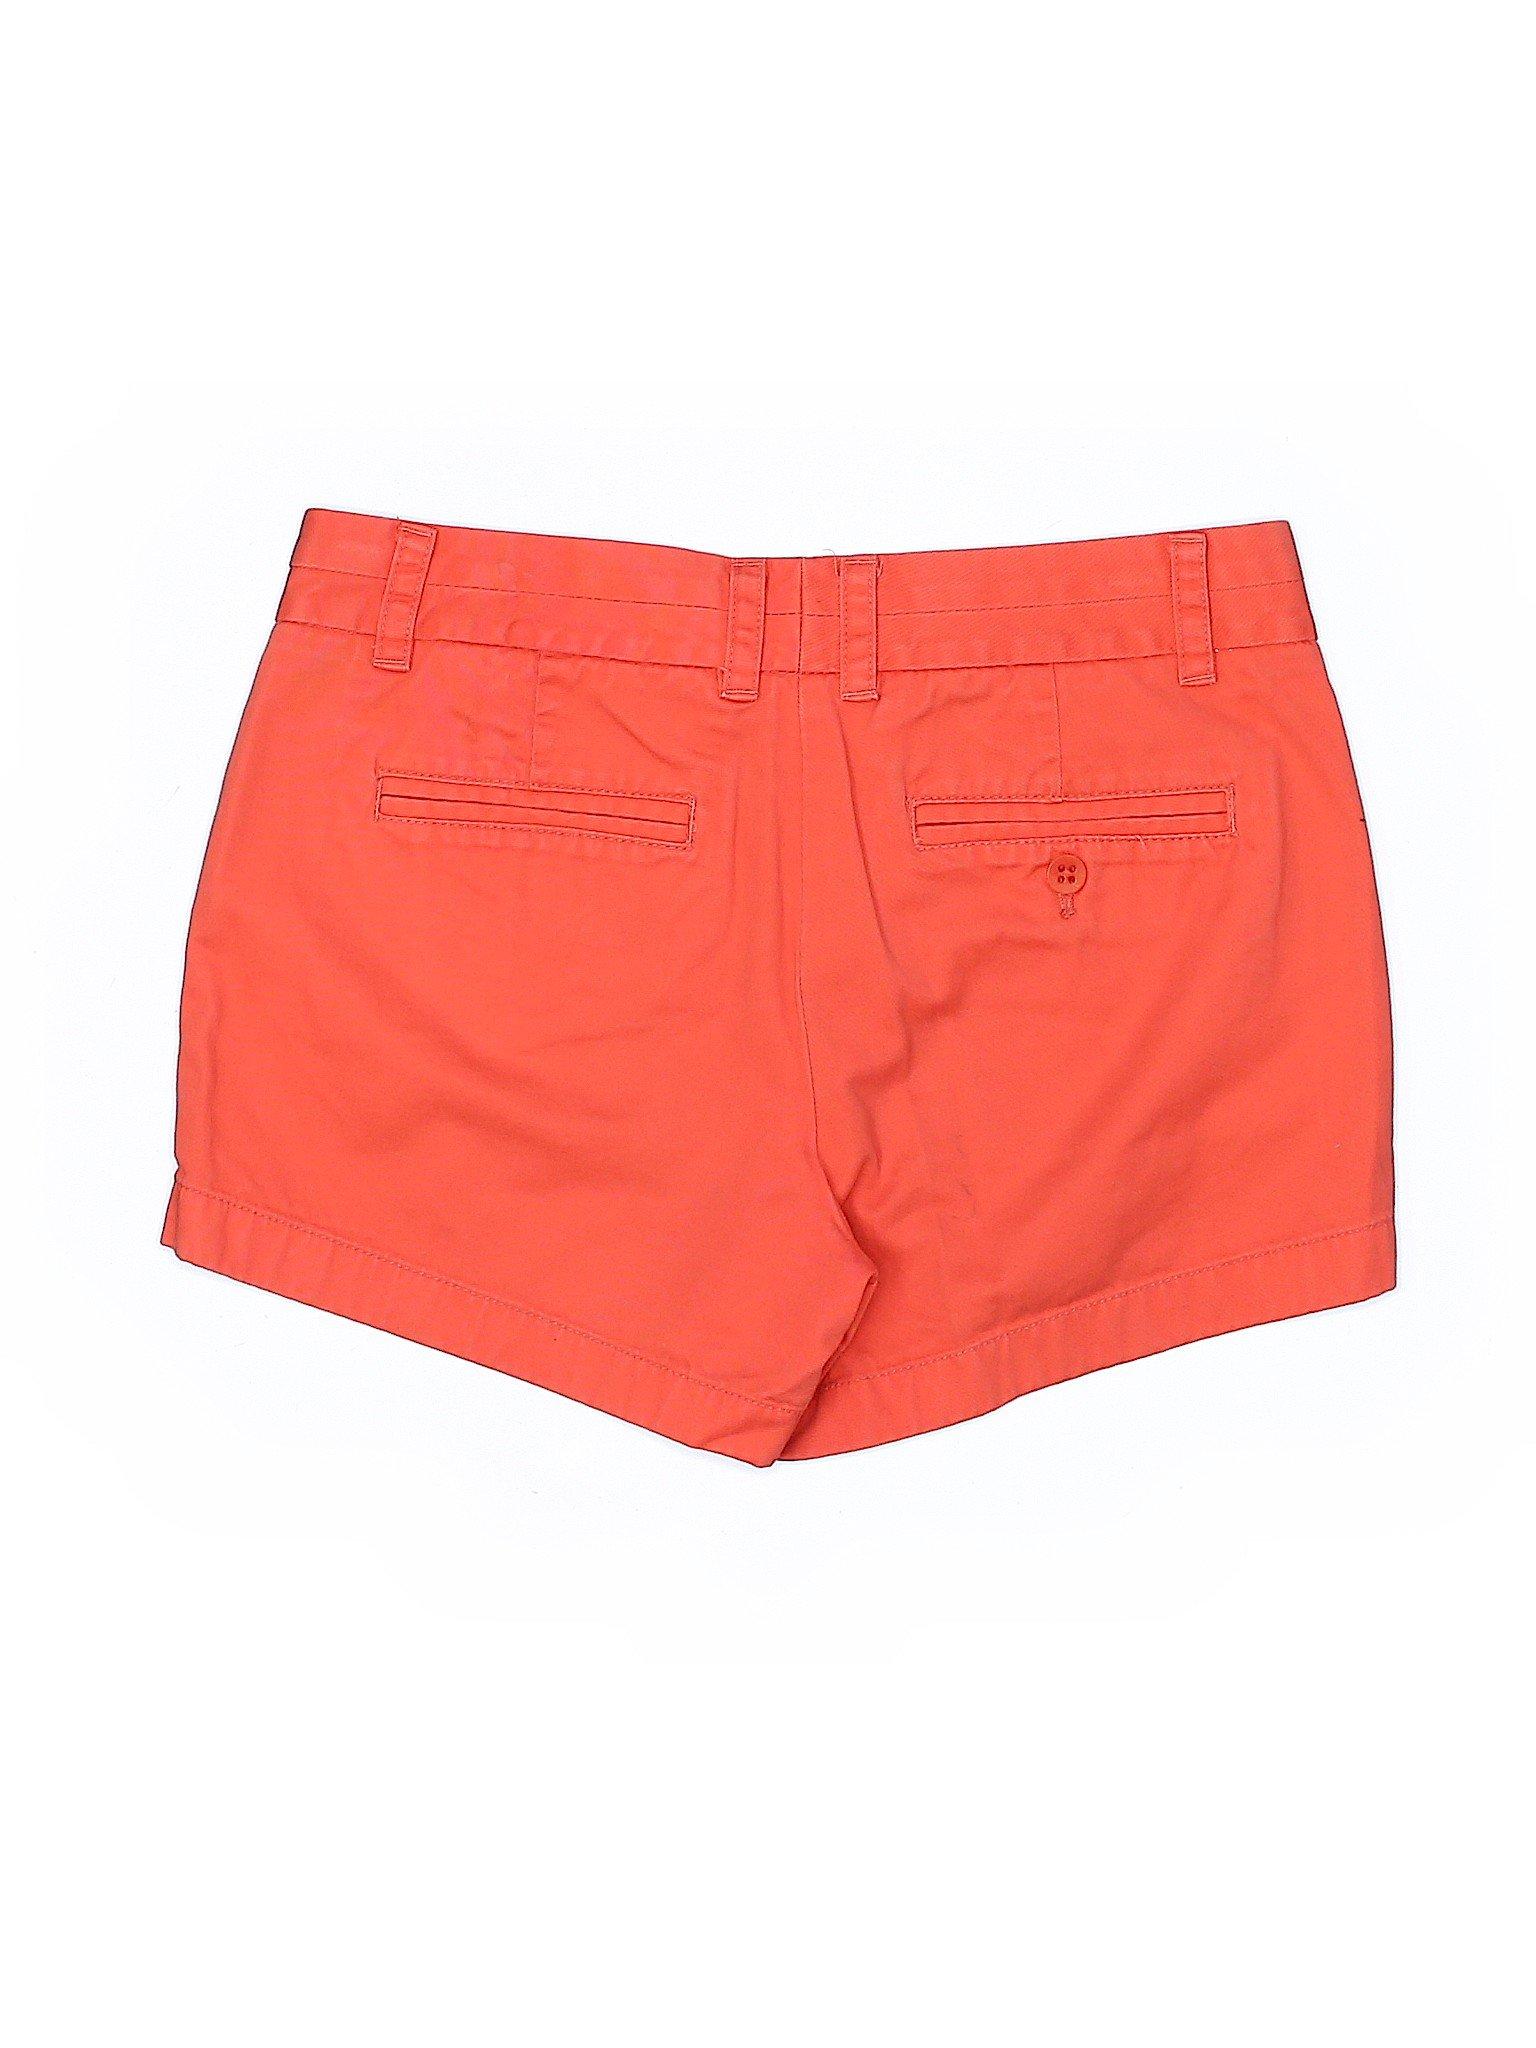 Shorts Boutique Boutique J Boutique J J Shorts Boutique Shorts Crew J Khaki Crew Khaki Crew Khaki qAtTHZw